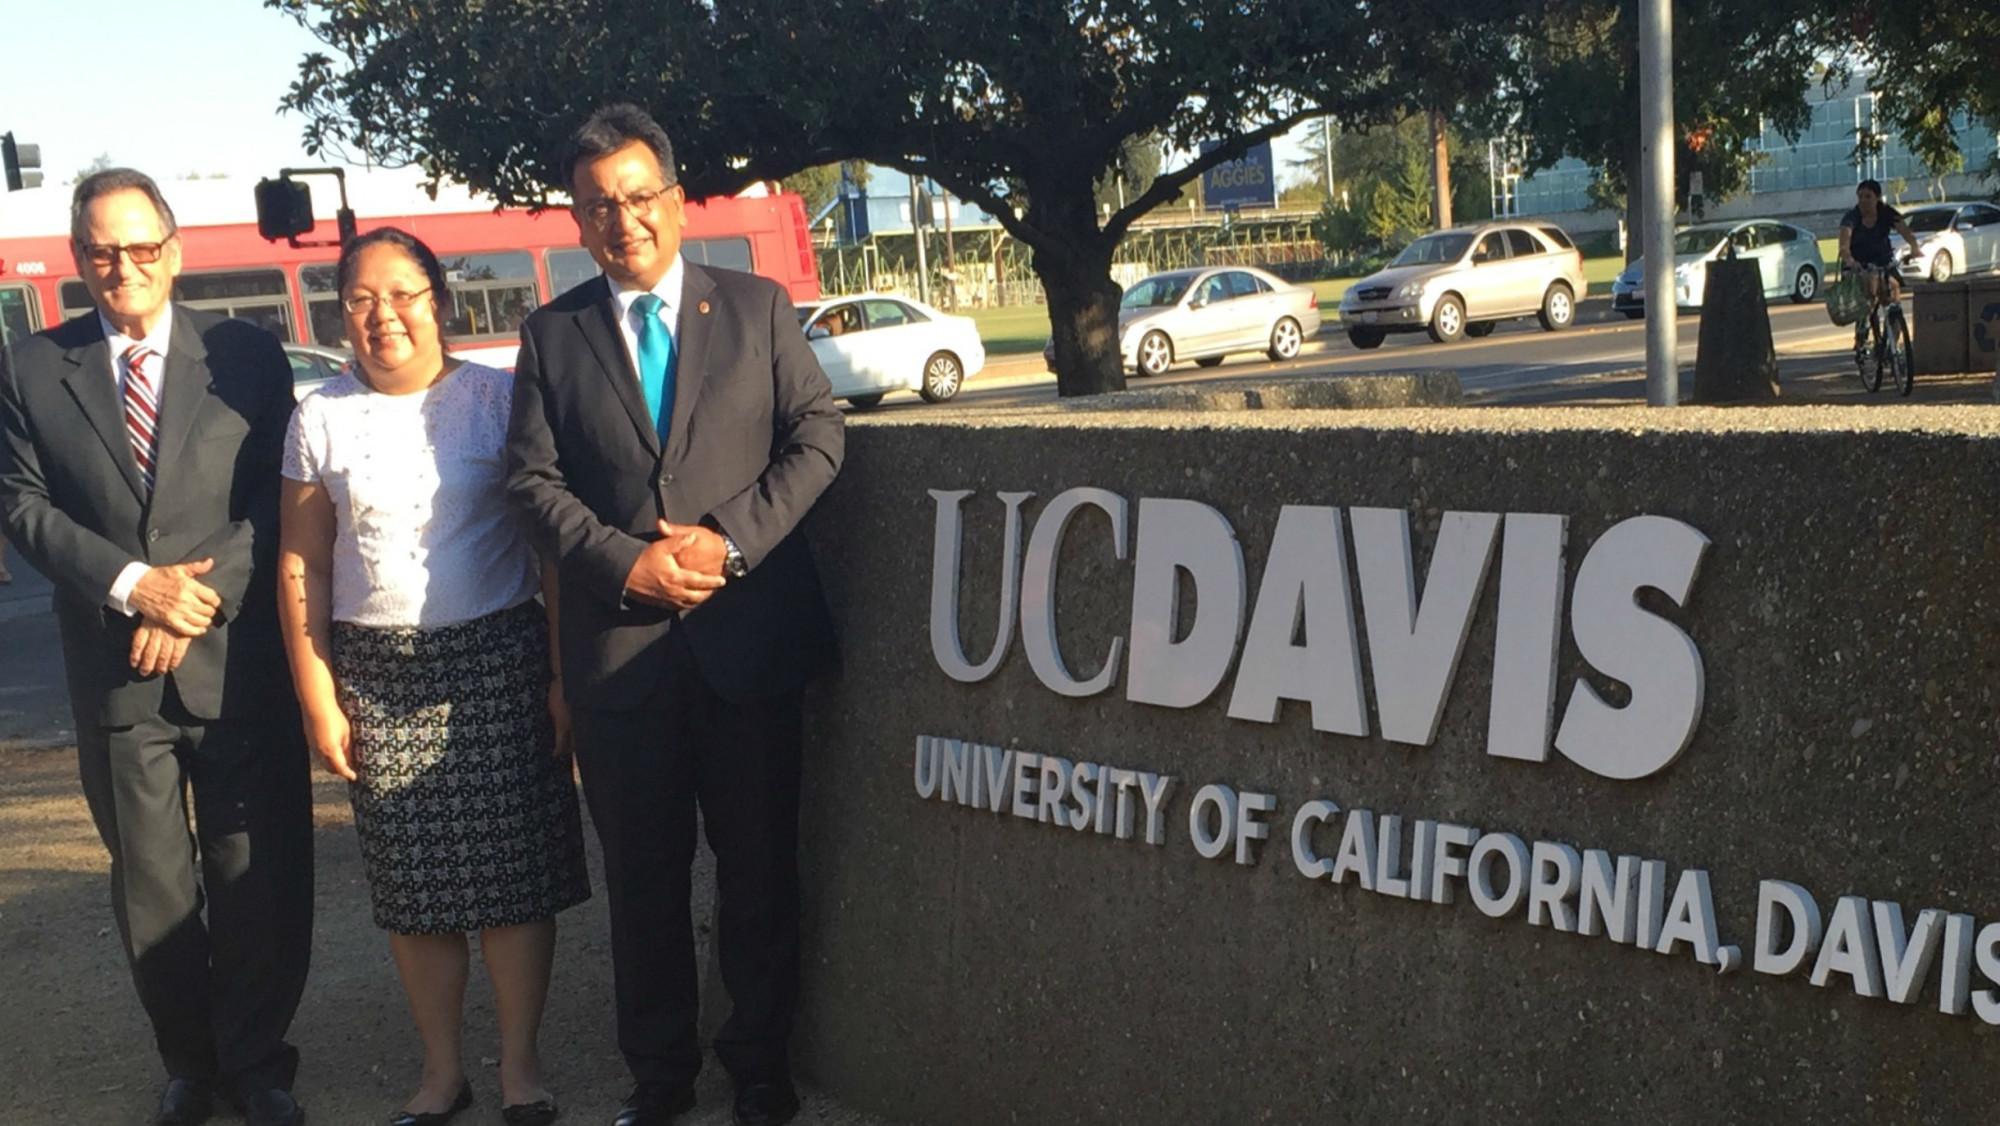 Visitan Uc Davis (1)